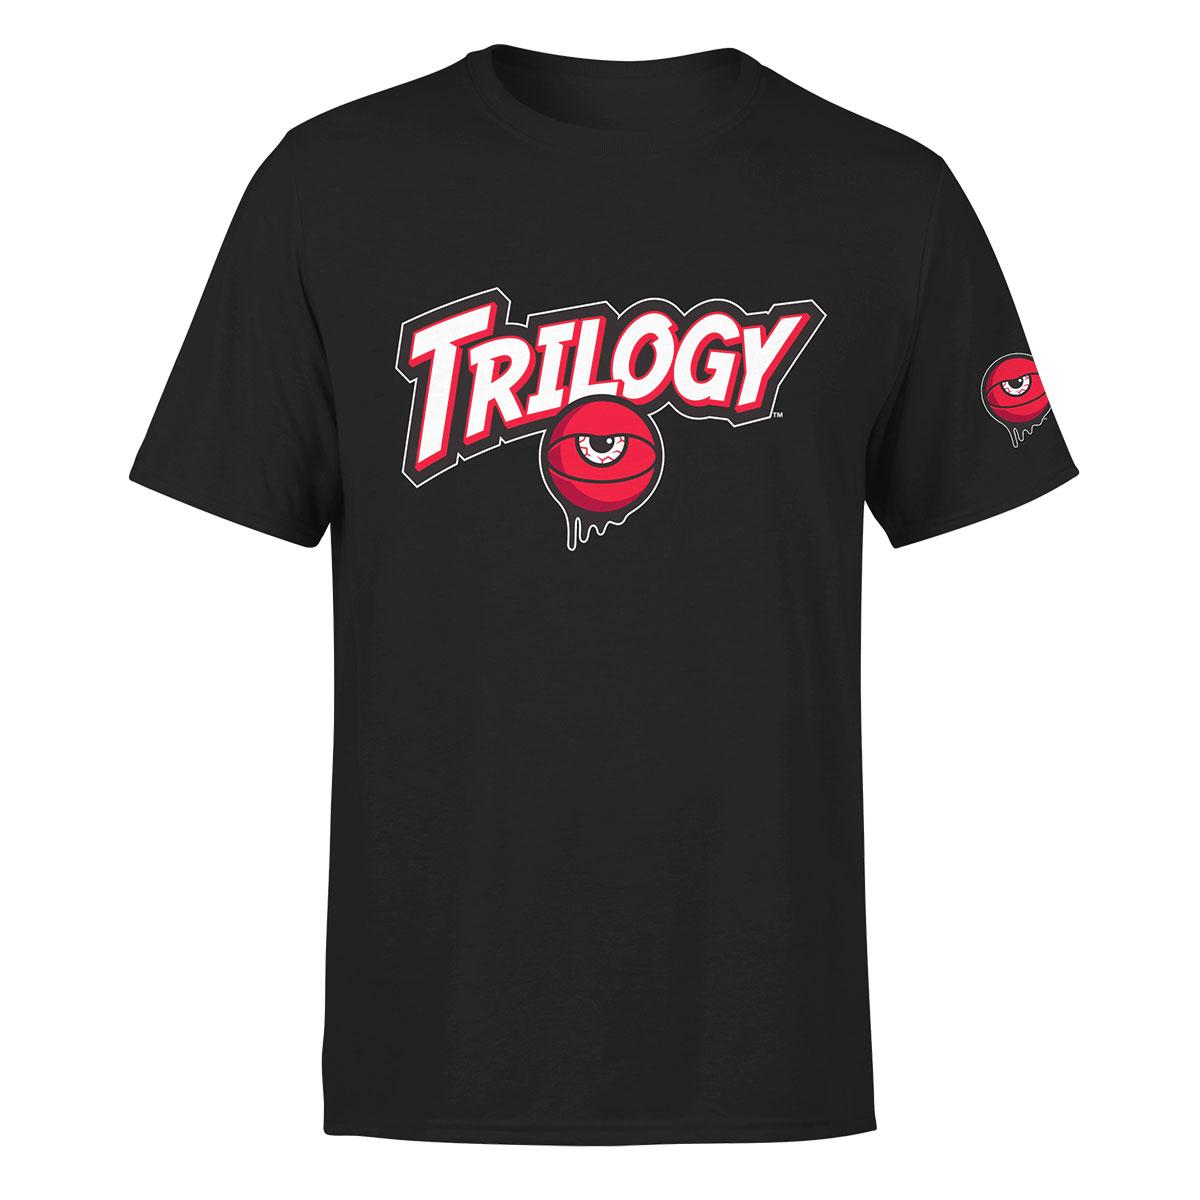 TRILOGY - BLACK T